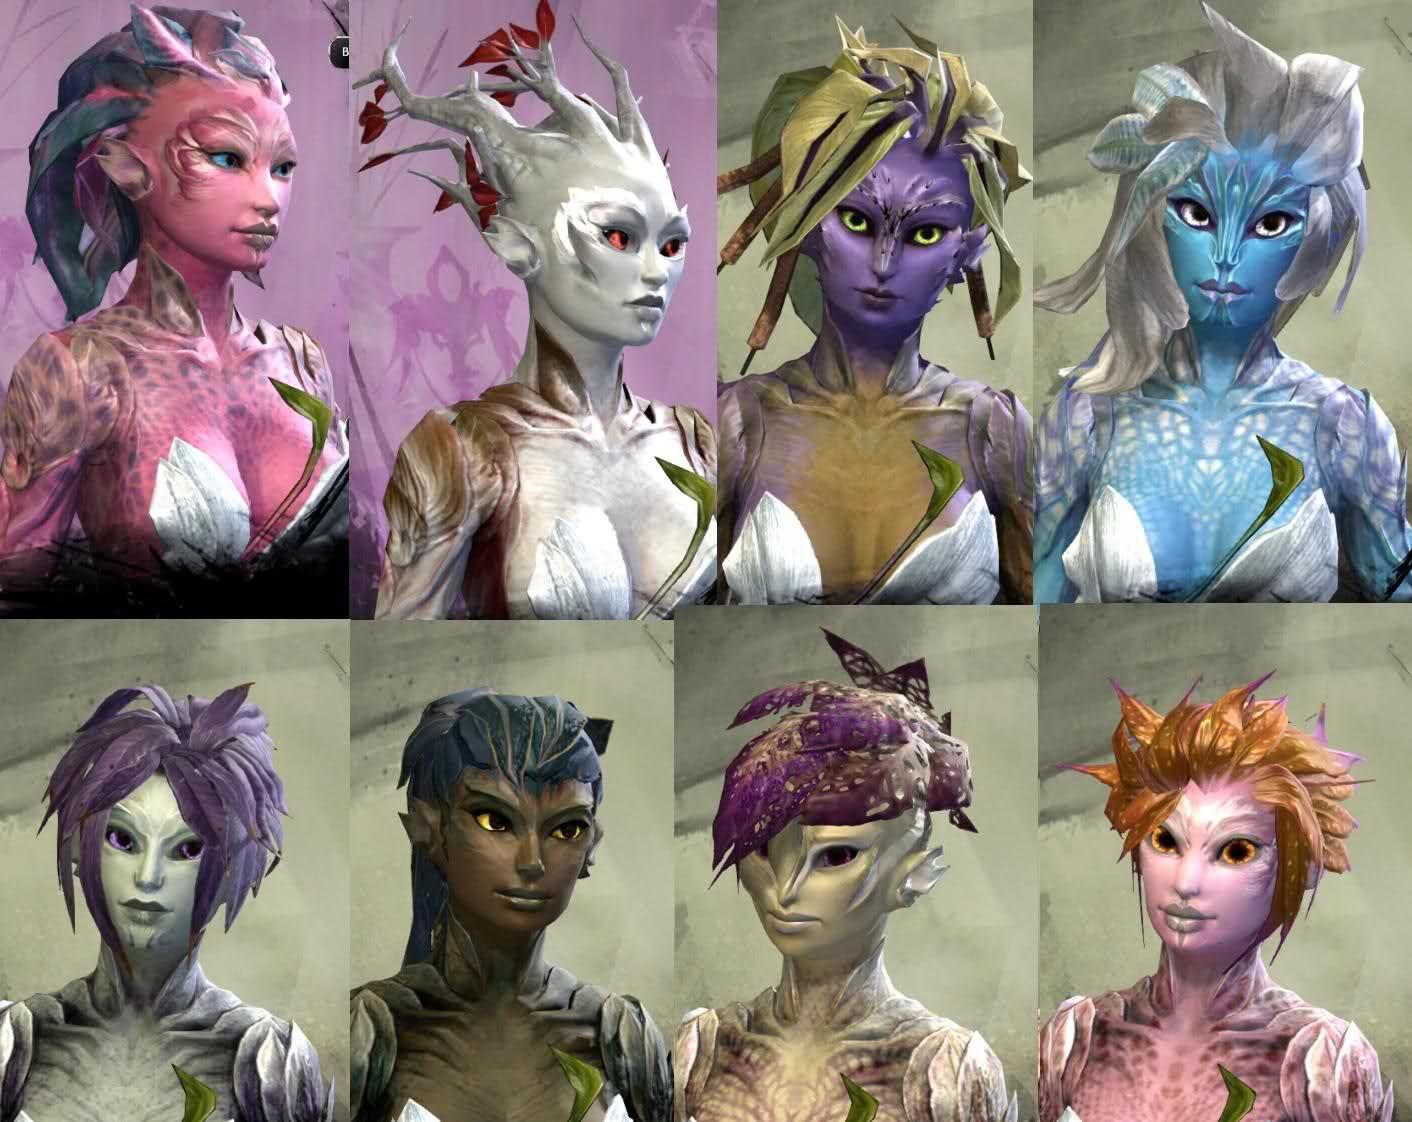 Pin By M Payson On Terra Sallies In 2020 Guild Wars Guild Wars 2 Alien Concept Art